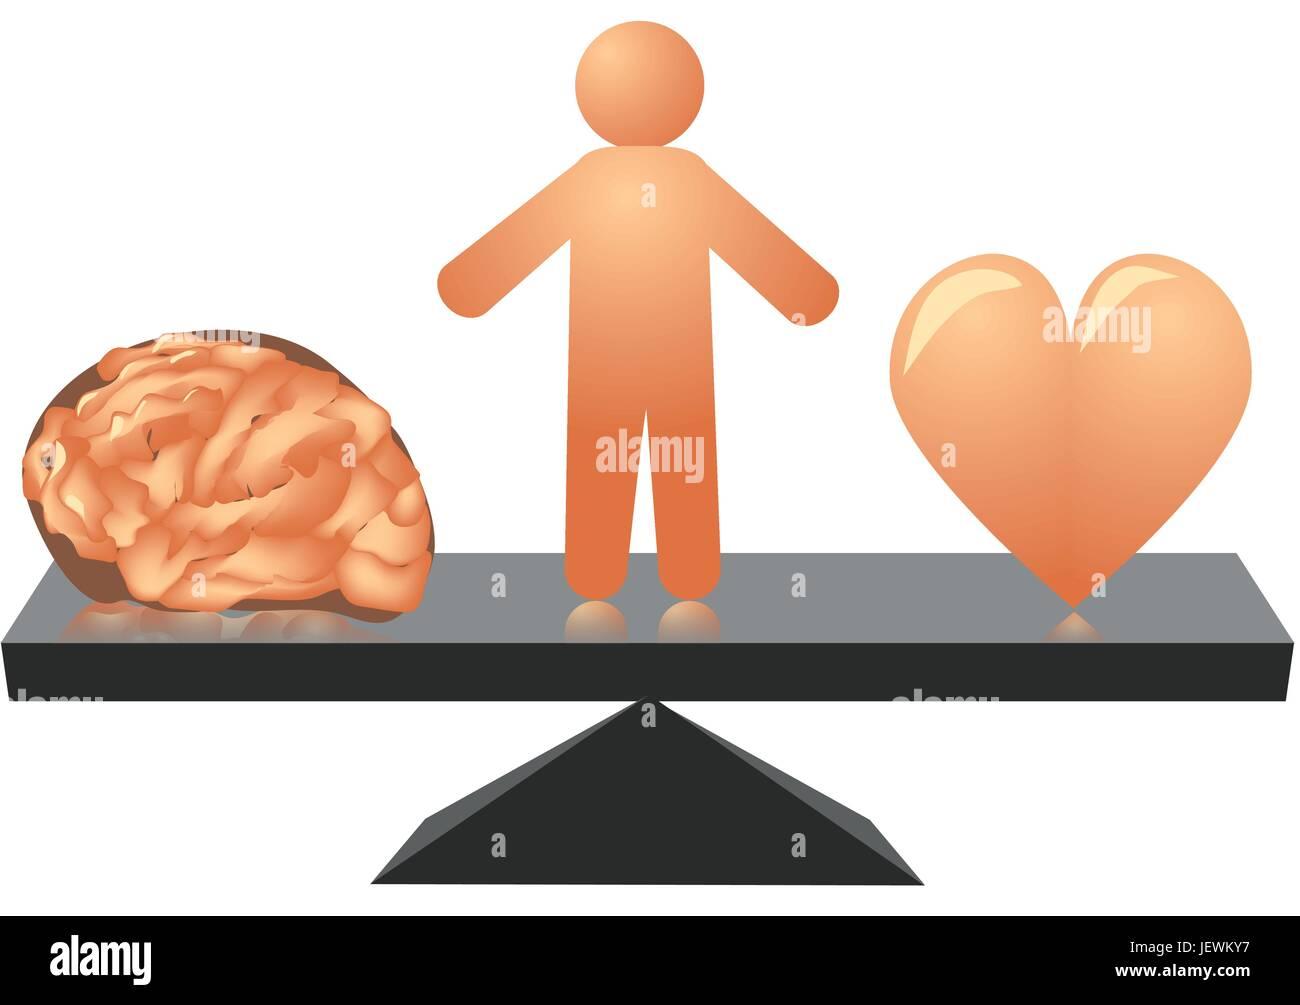 anatomy brain - Stock Vector